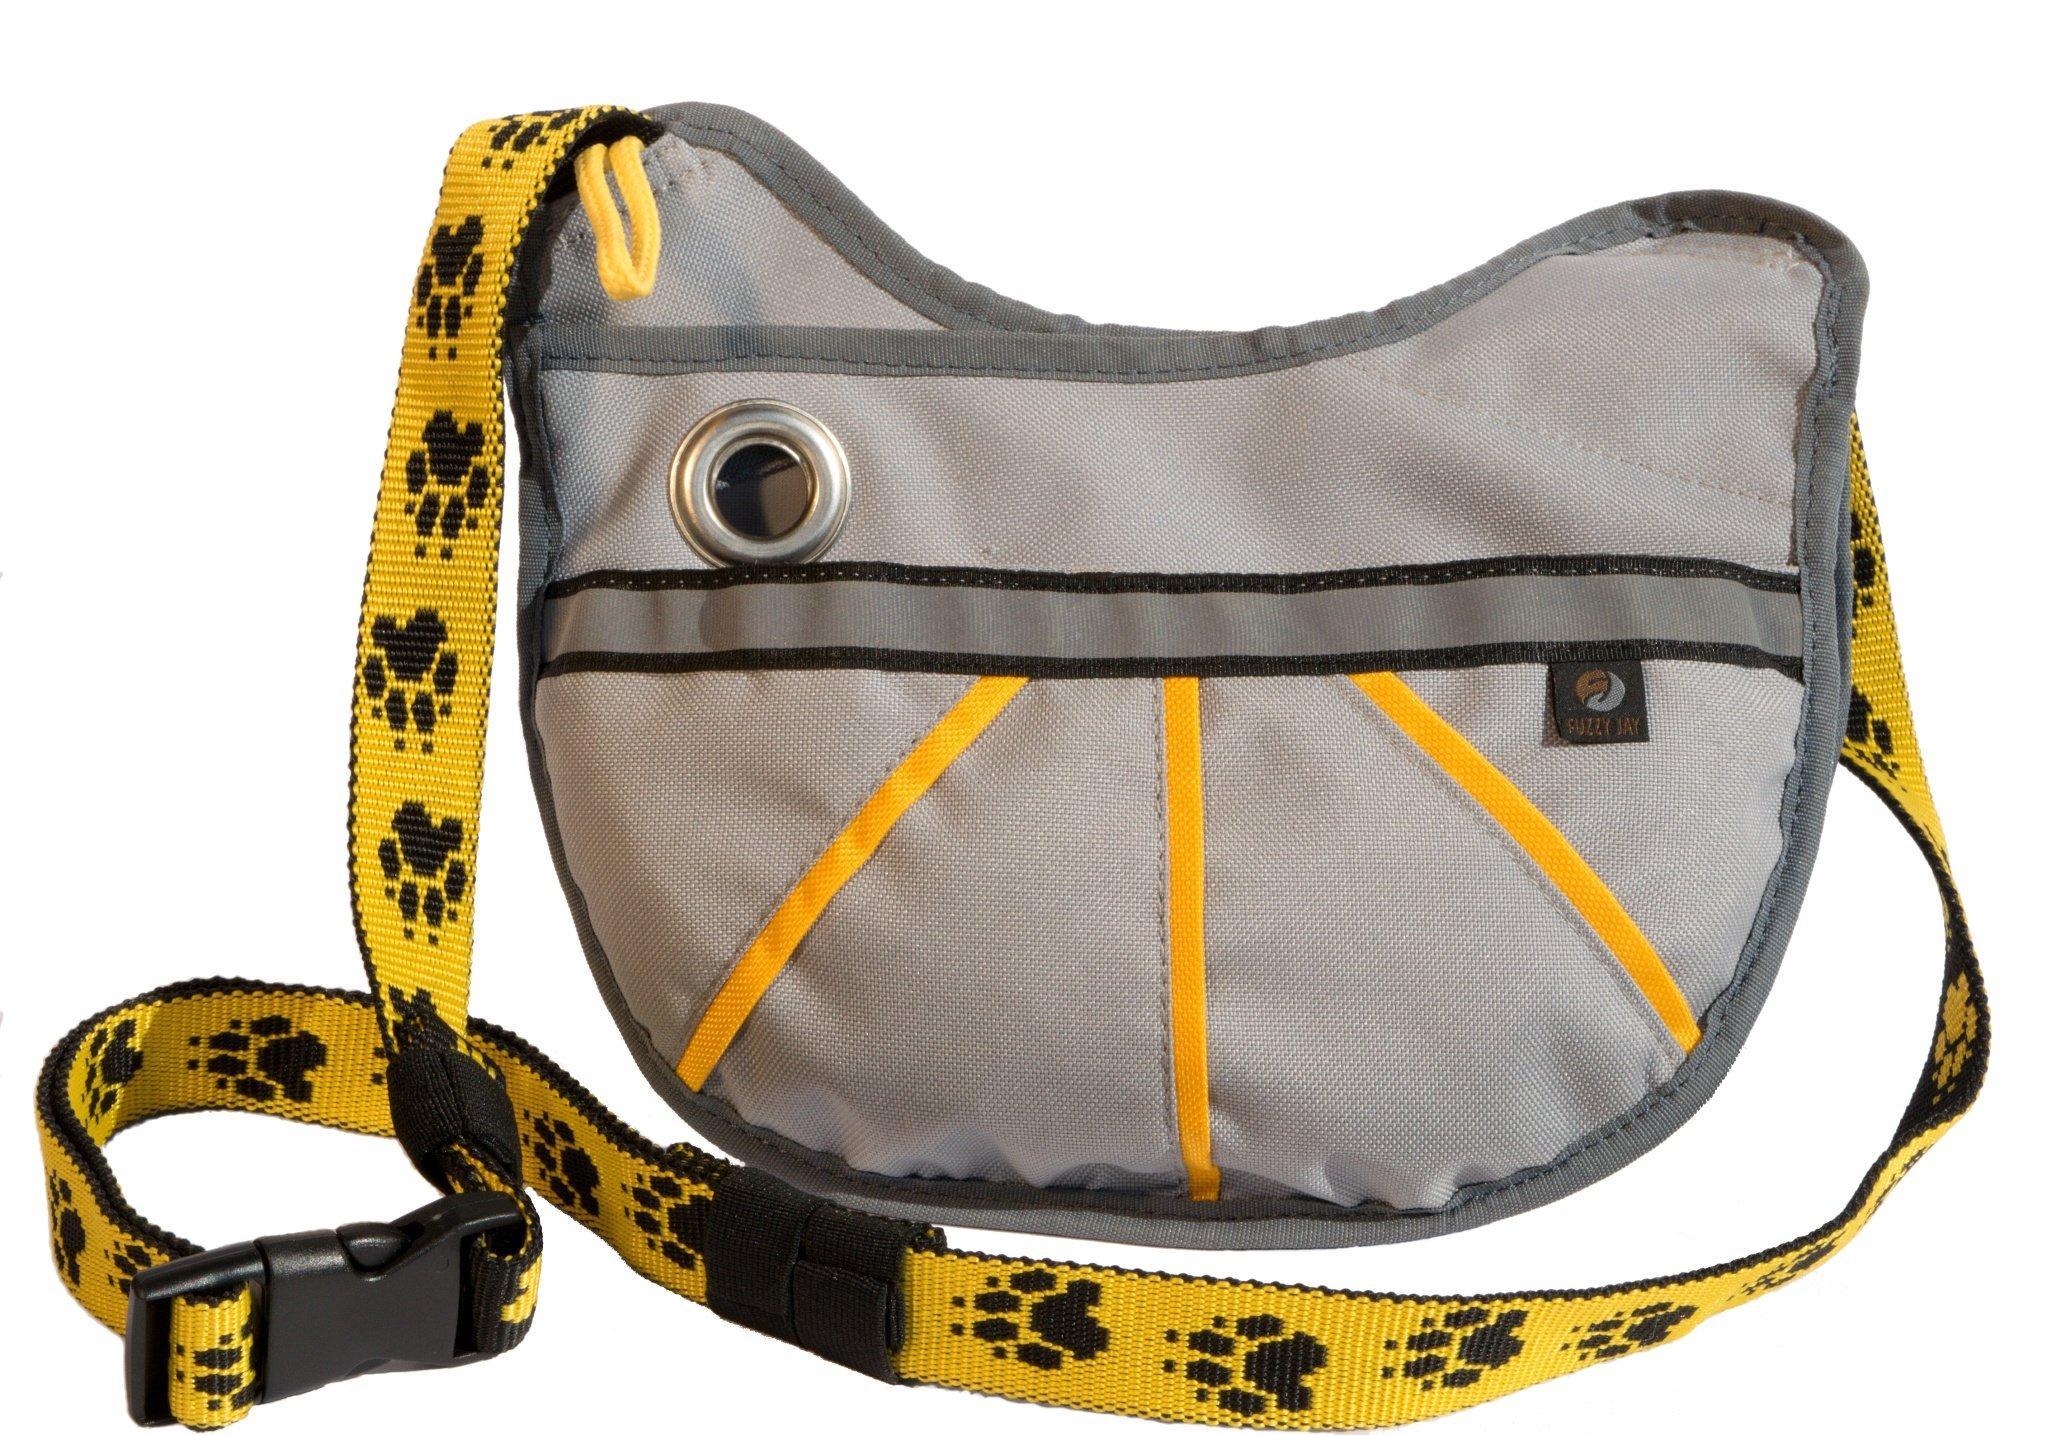 FUZZY JAY Agility Training Bag - Dog Treat Pouch (grey/yellow)